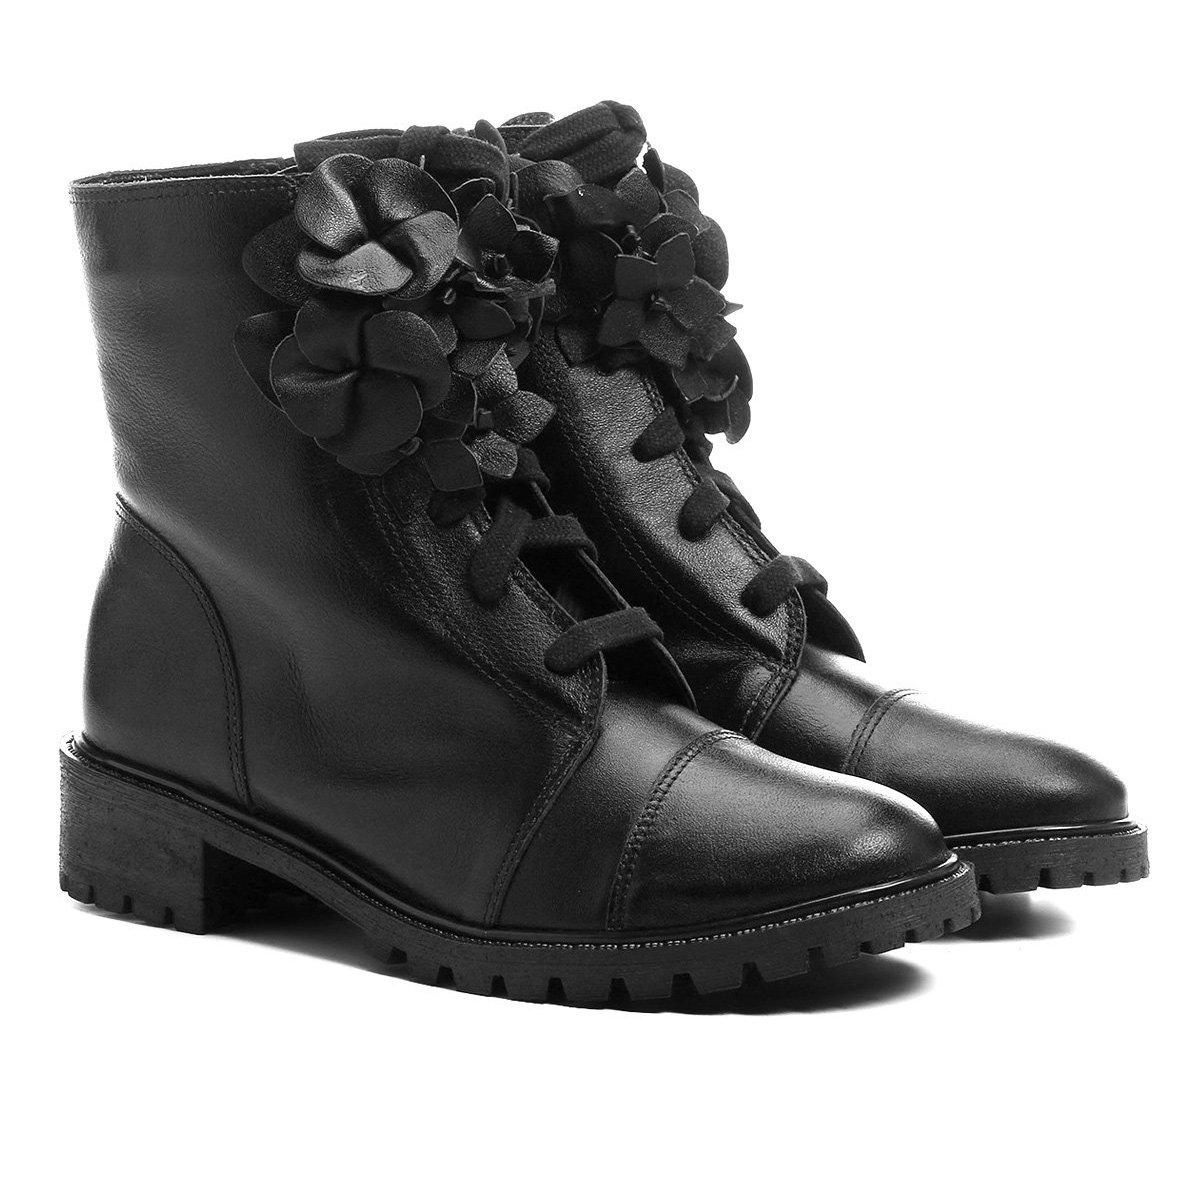 8bc38d094d Bota Couro Coturno Shoestock Flores Feminina - Compre Agora